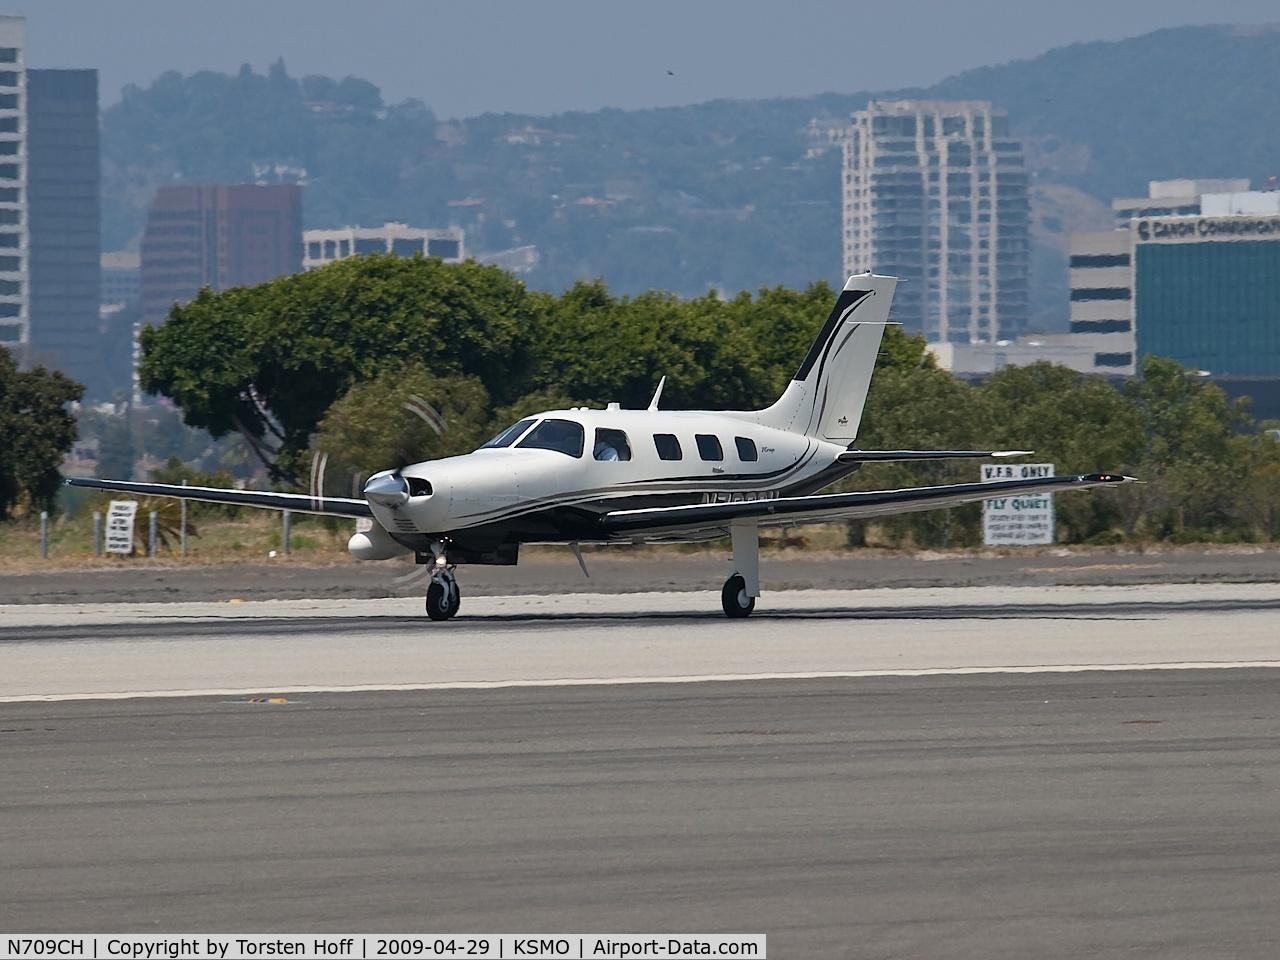 N709CH, 2007 Piper PA-46-350P Malibu Mirage C/N 4636431, N709CH departing from RWY 21